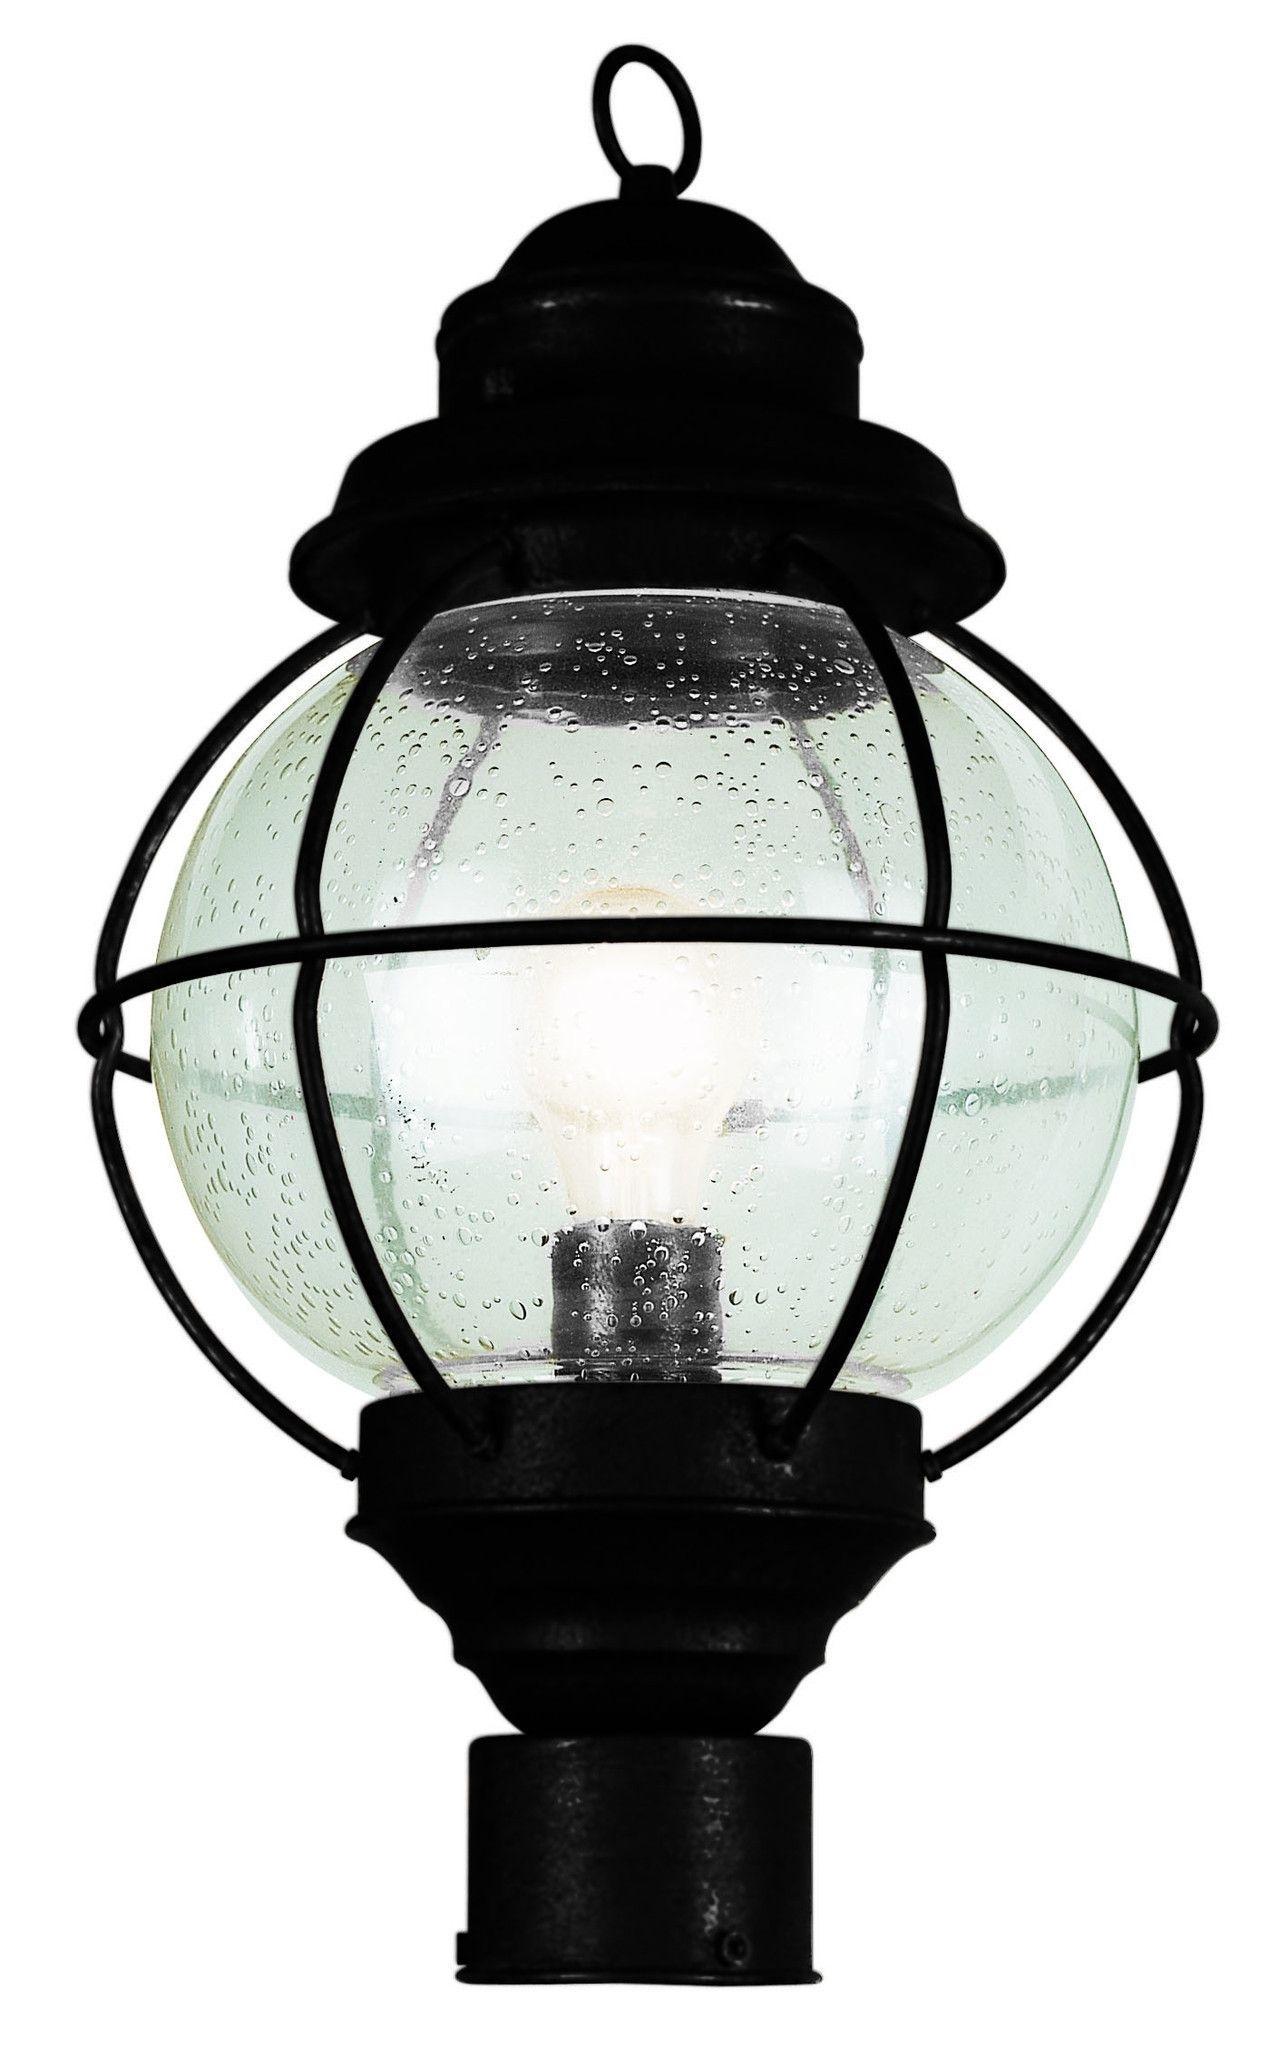 "Trans Globe Lighting 69902 Bk Onion Lantern Post Top 15"" Black pertaining to Outdoor Lighting Onion Lanterns (Image 18 of 20)"